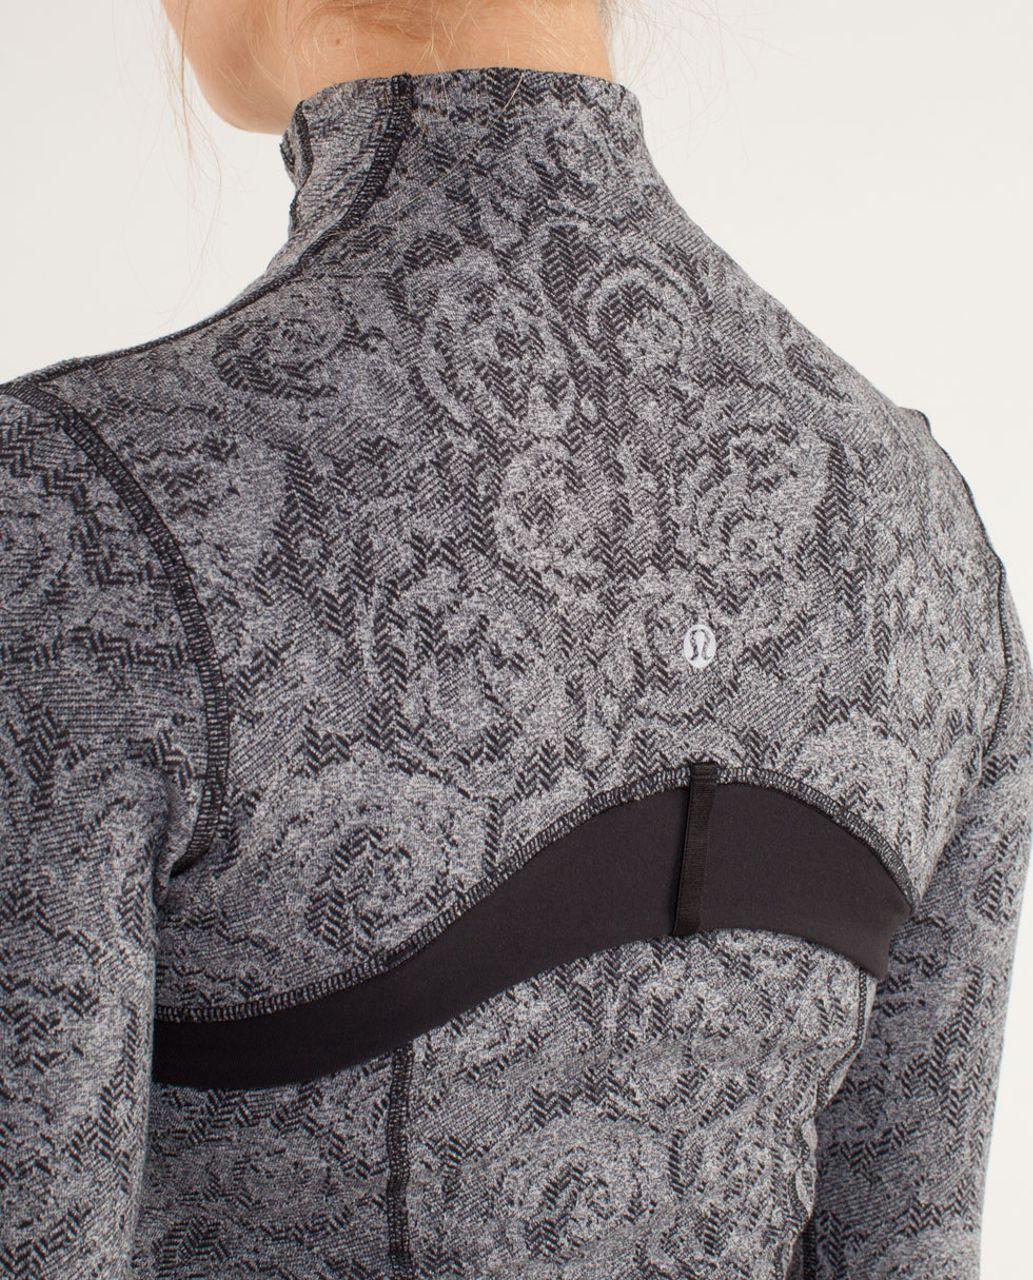 Lululemon Define Jacket *Brushed - Rose Herringbone Black / Black